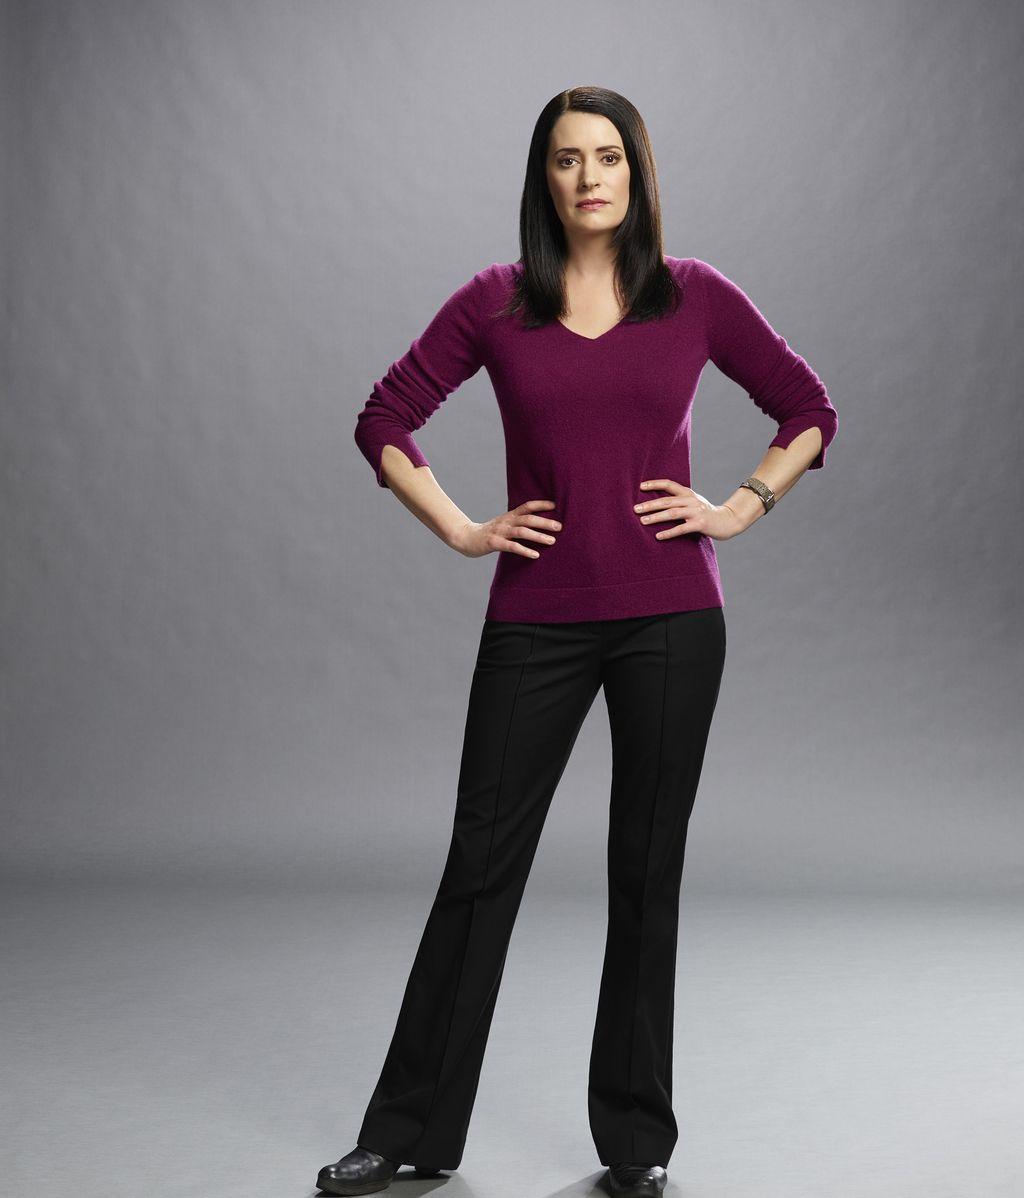 Personajes de la 12ª temporada de 'Mentes criminales': Paget Brewster es Emily Prentiss